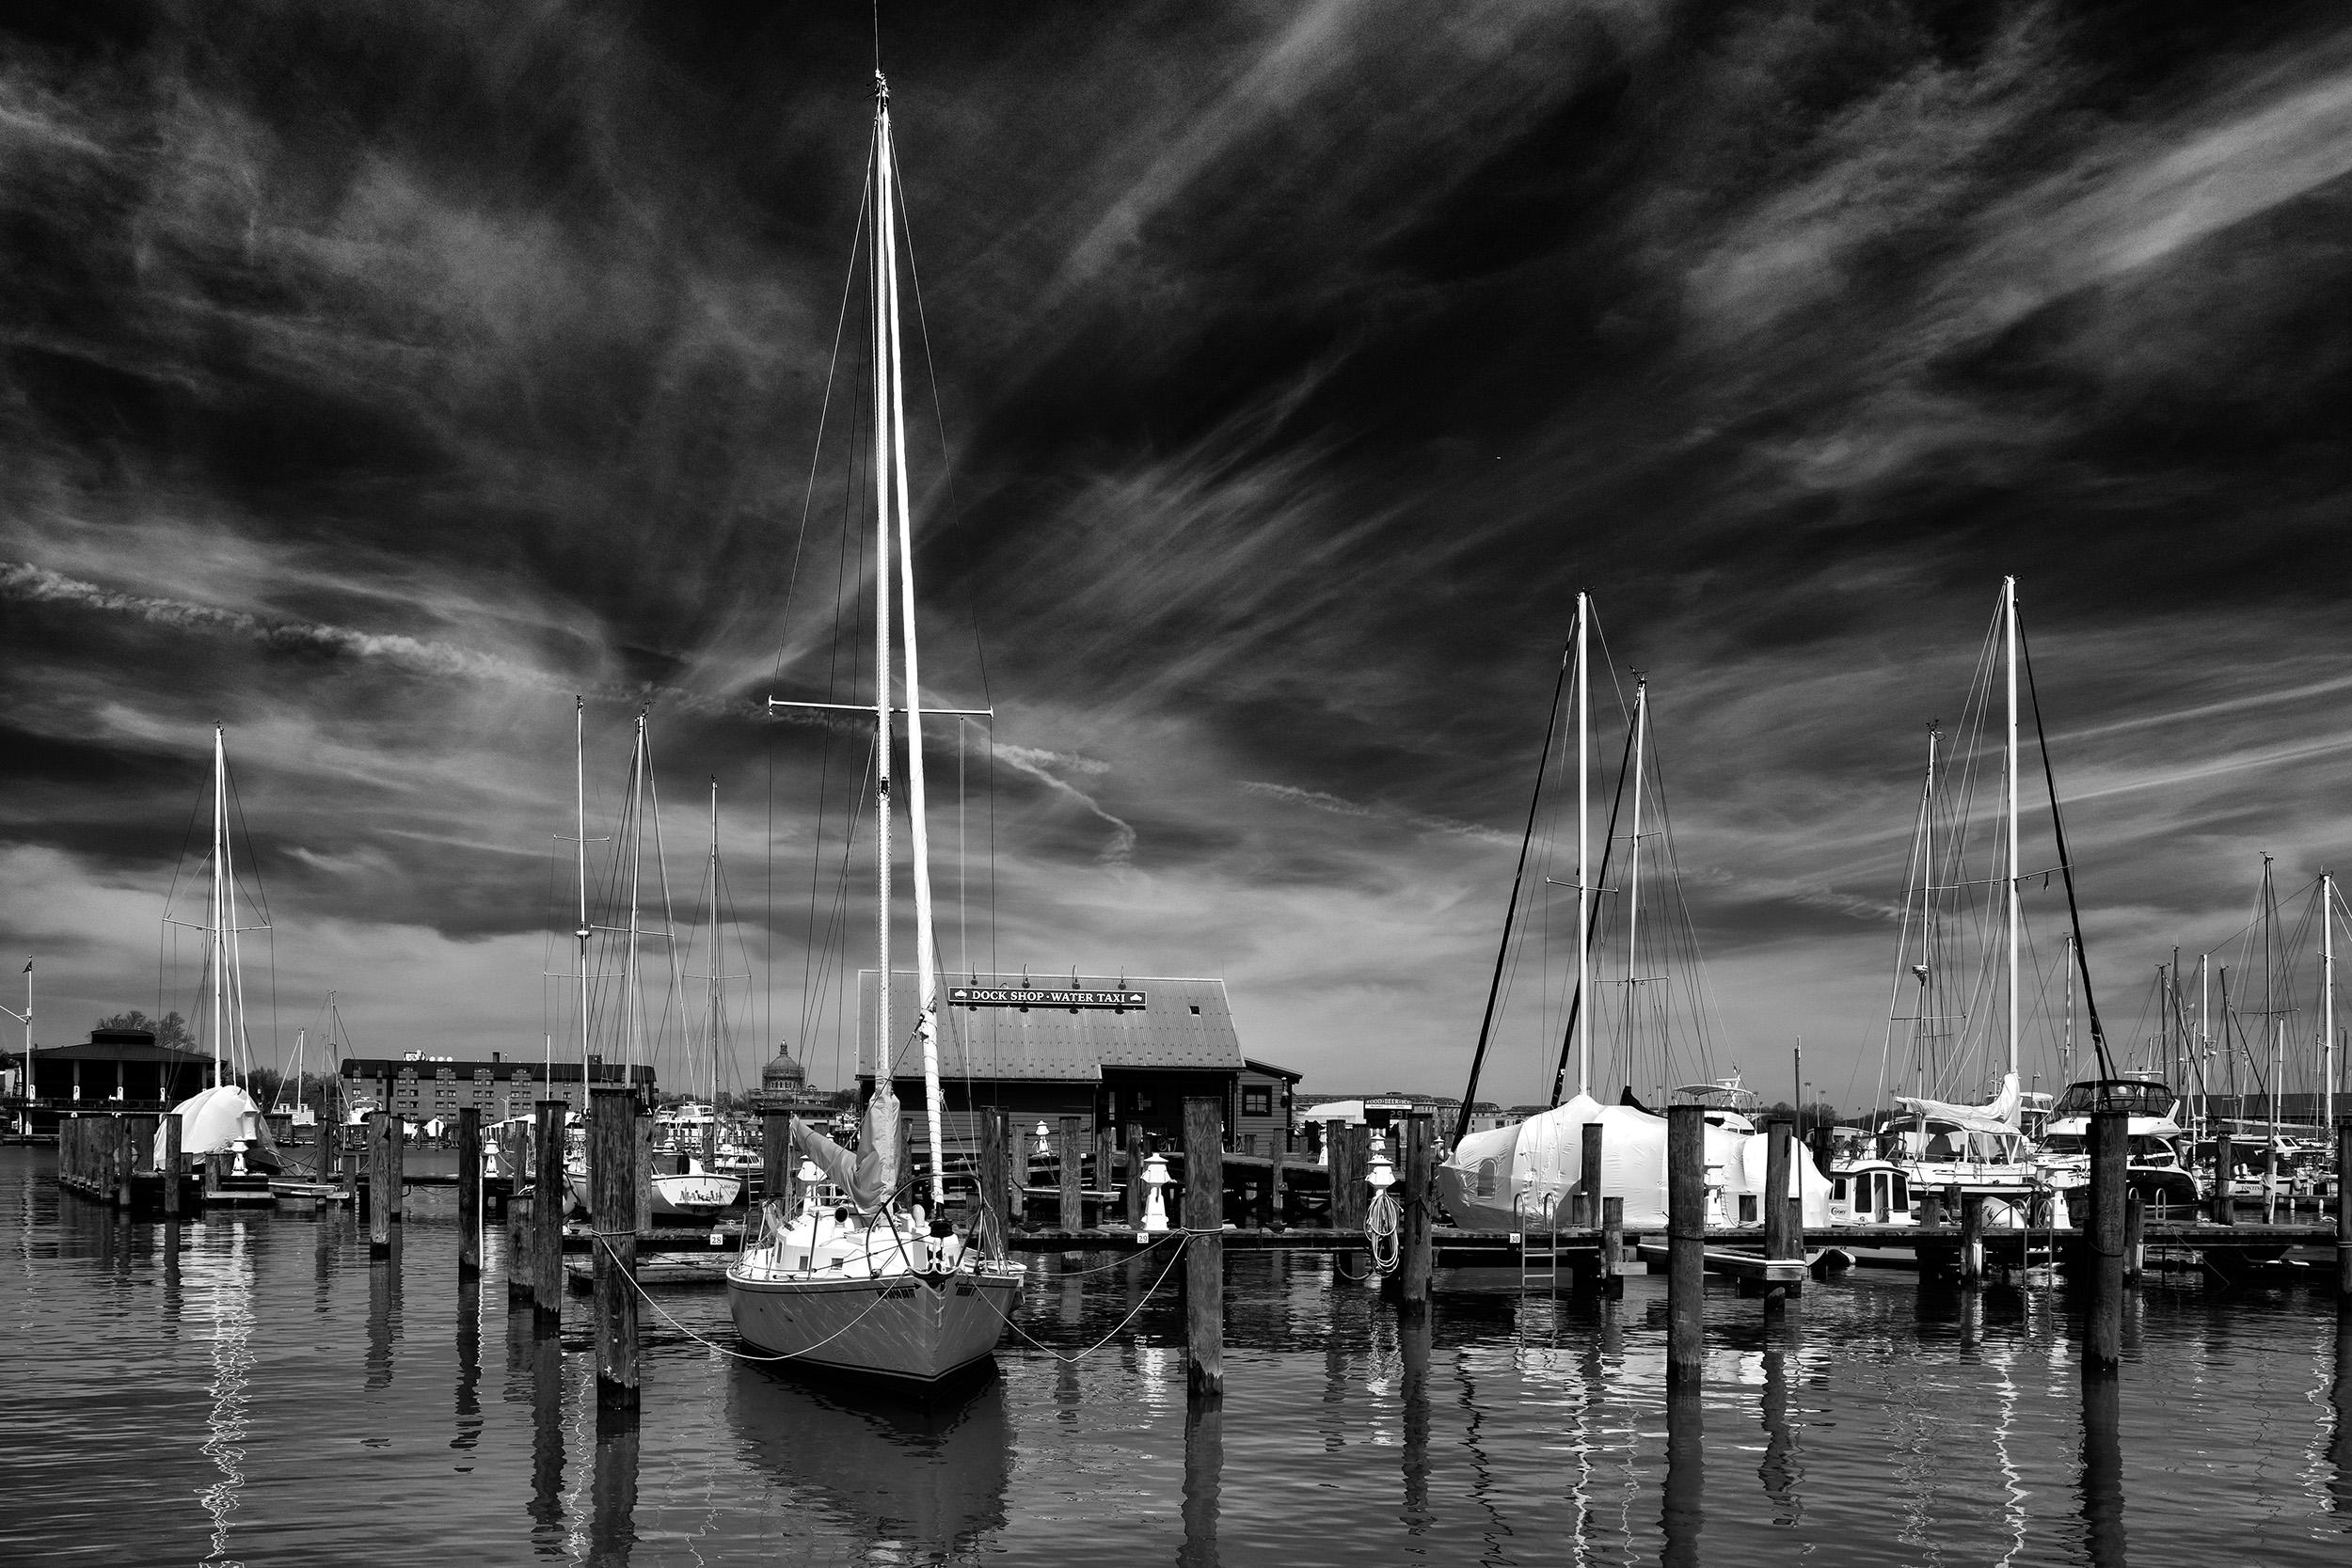 190327 Annapolis Maritime Museum 07-1 bw.jpg